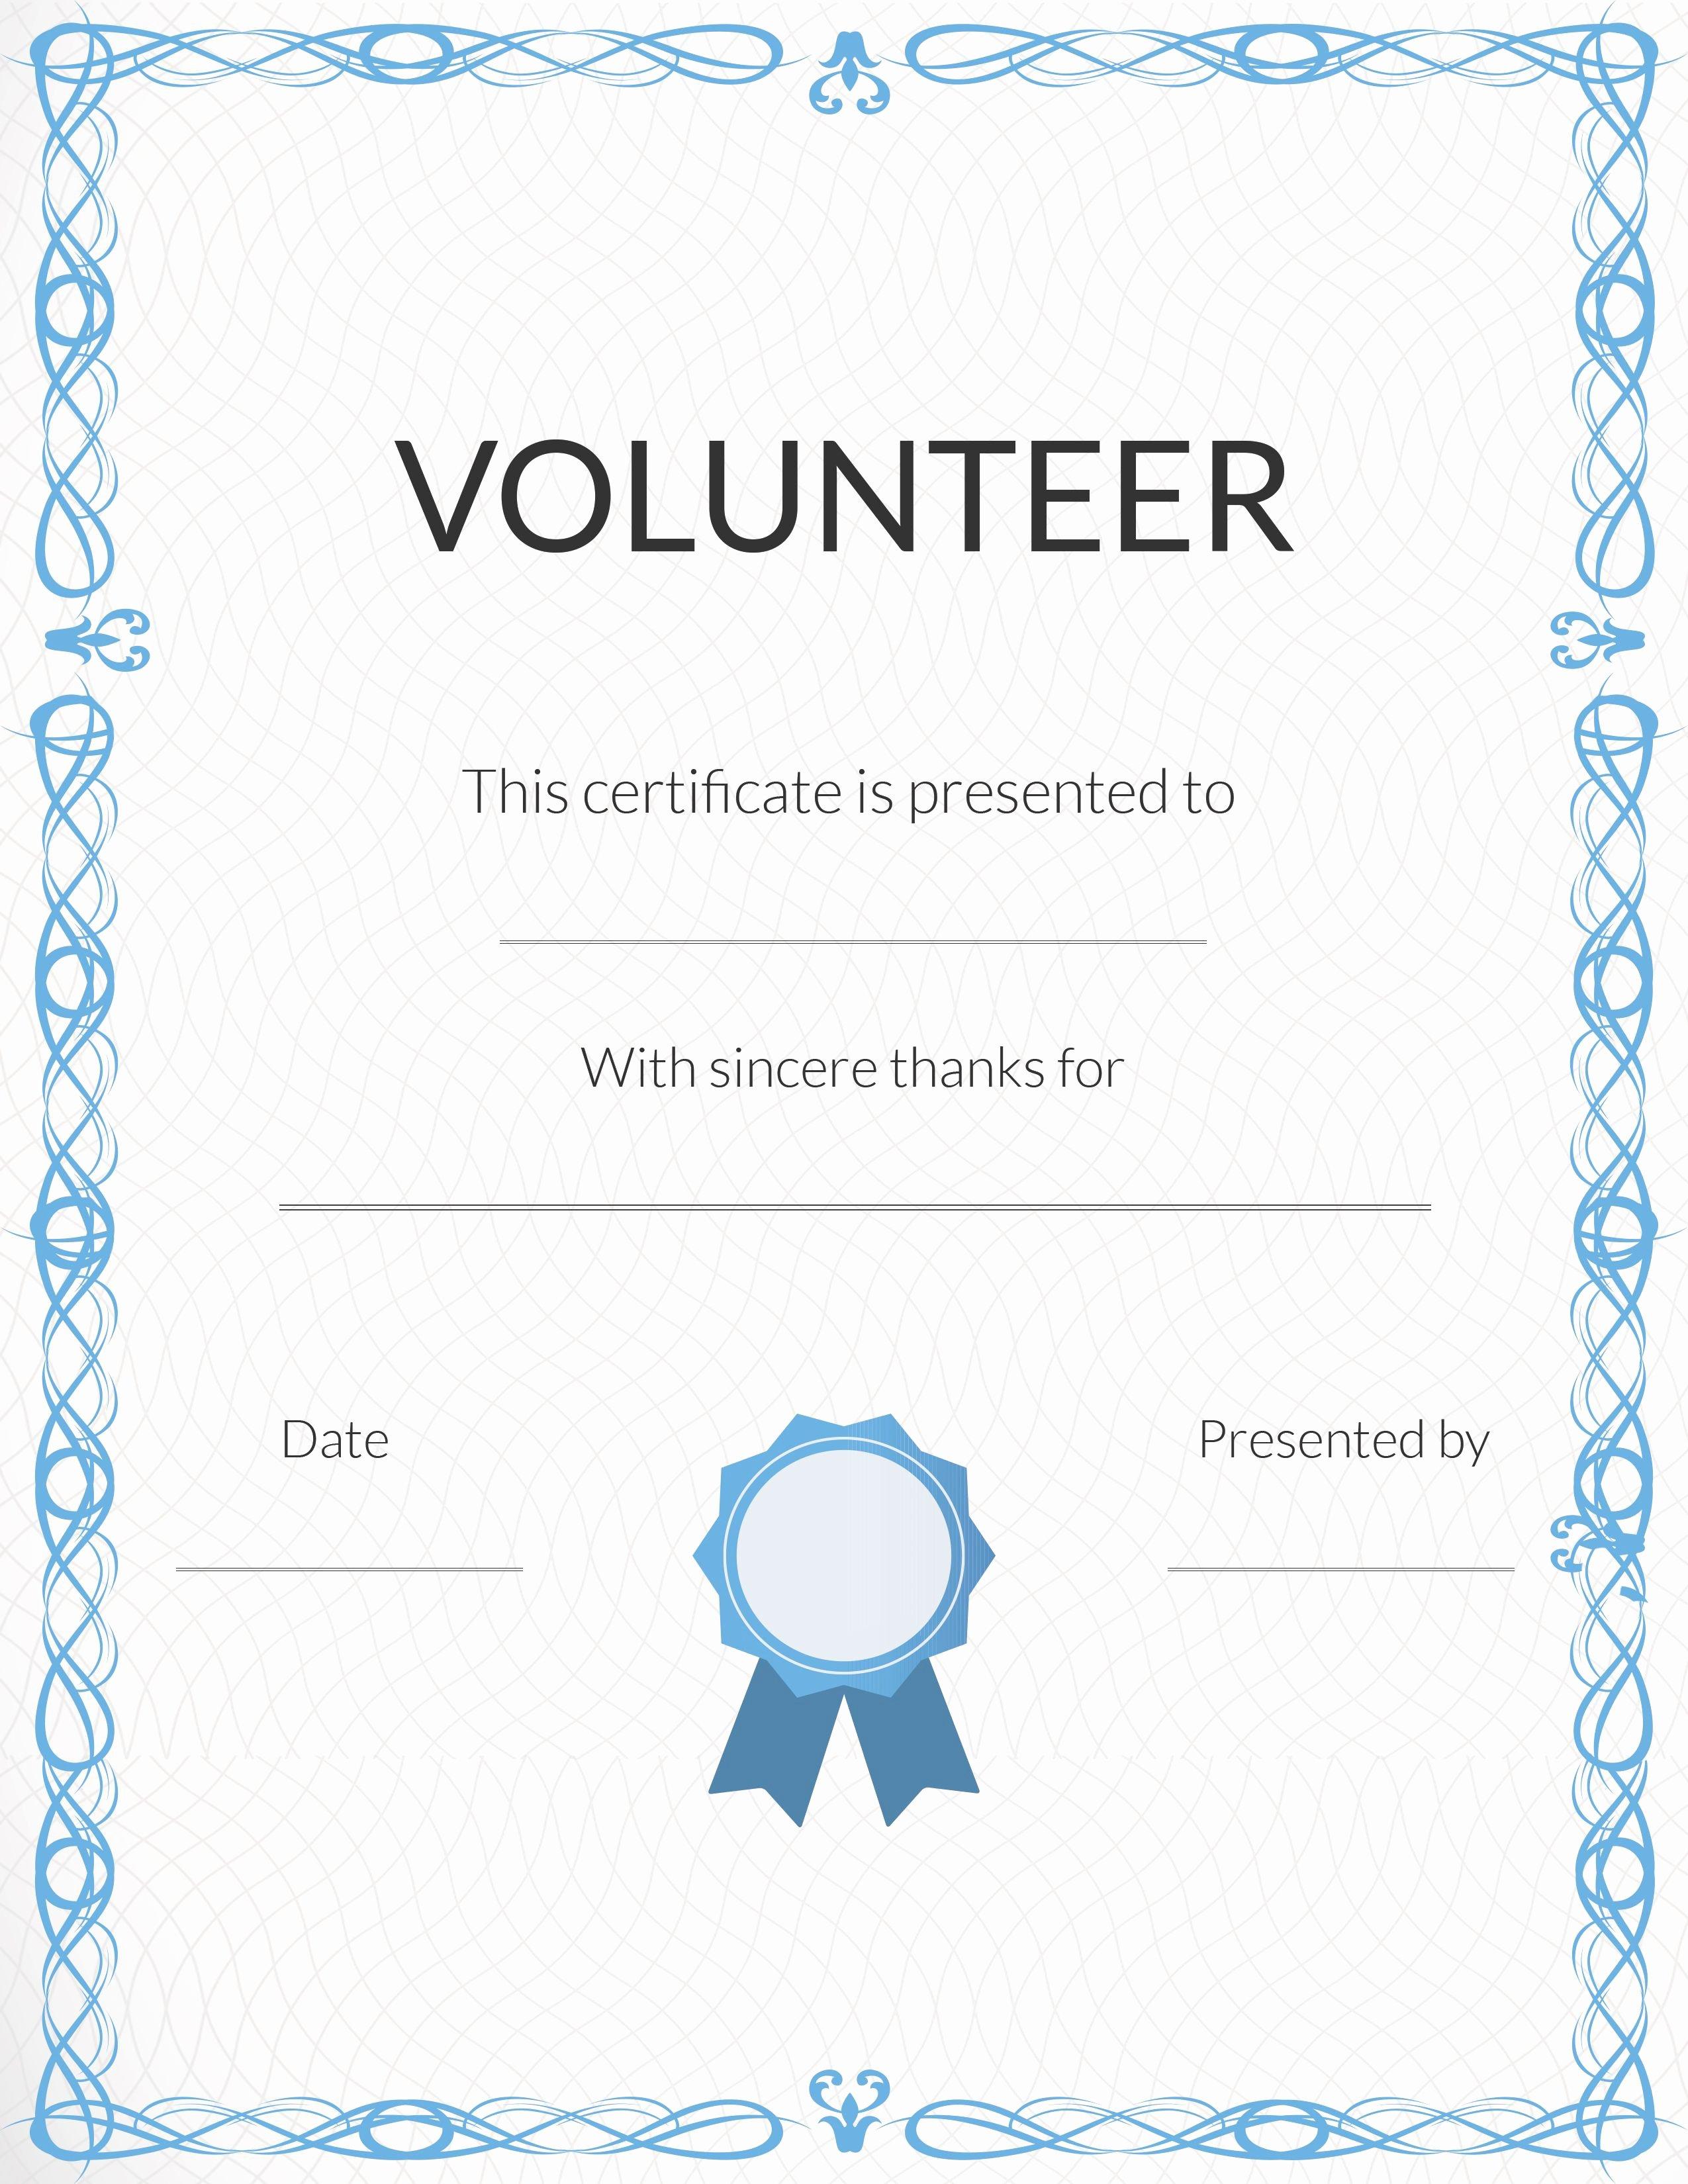 Volunteer Appreciation Certificate Template Inspirational Free Volunteer Appreciation Certificates — Signup